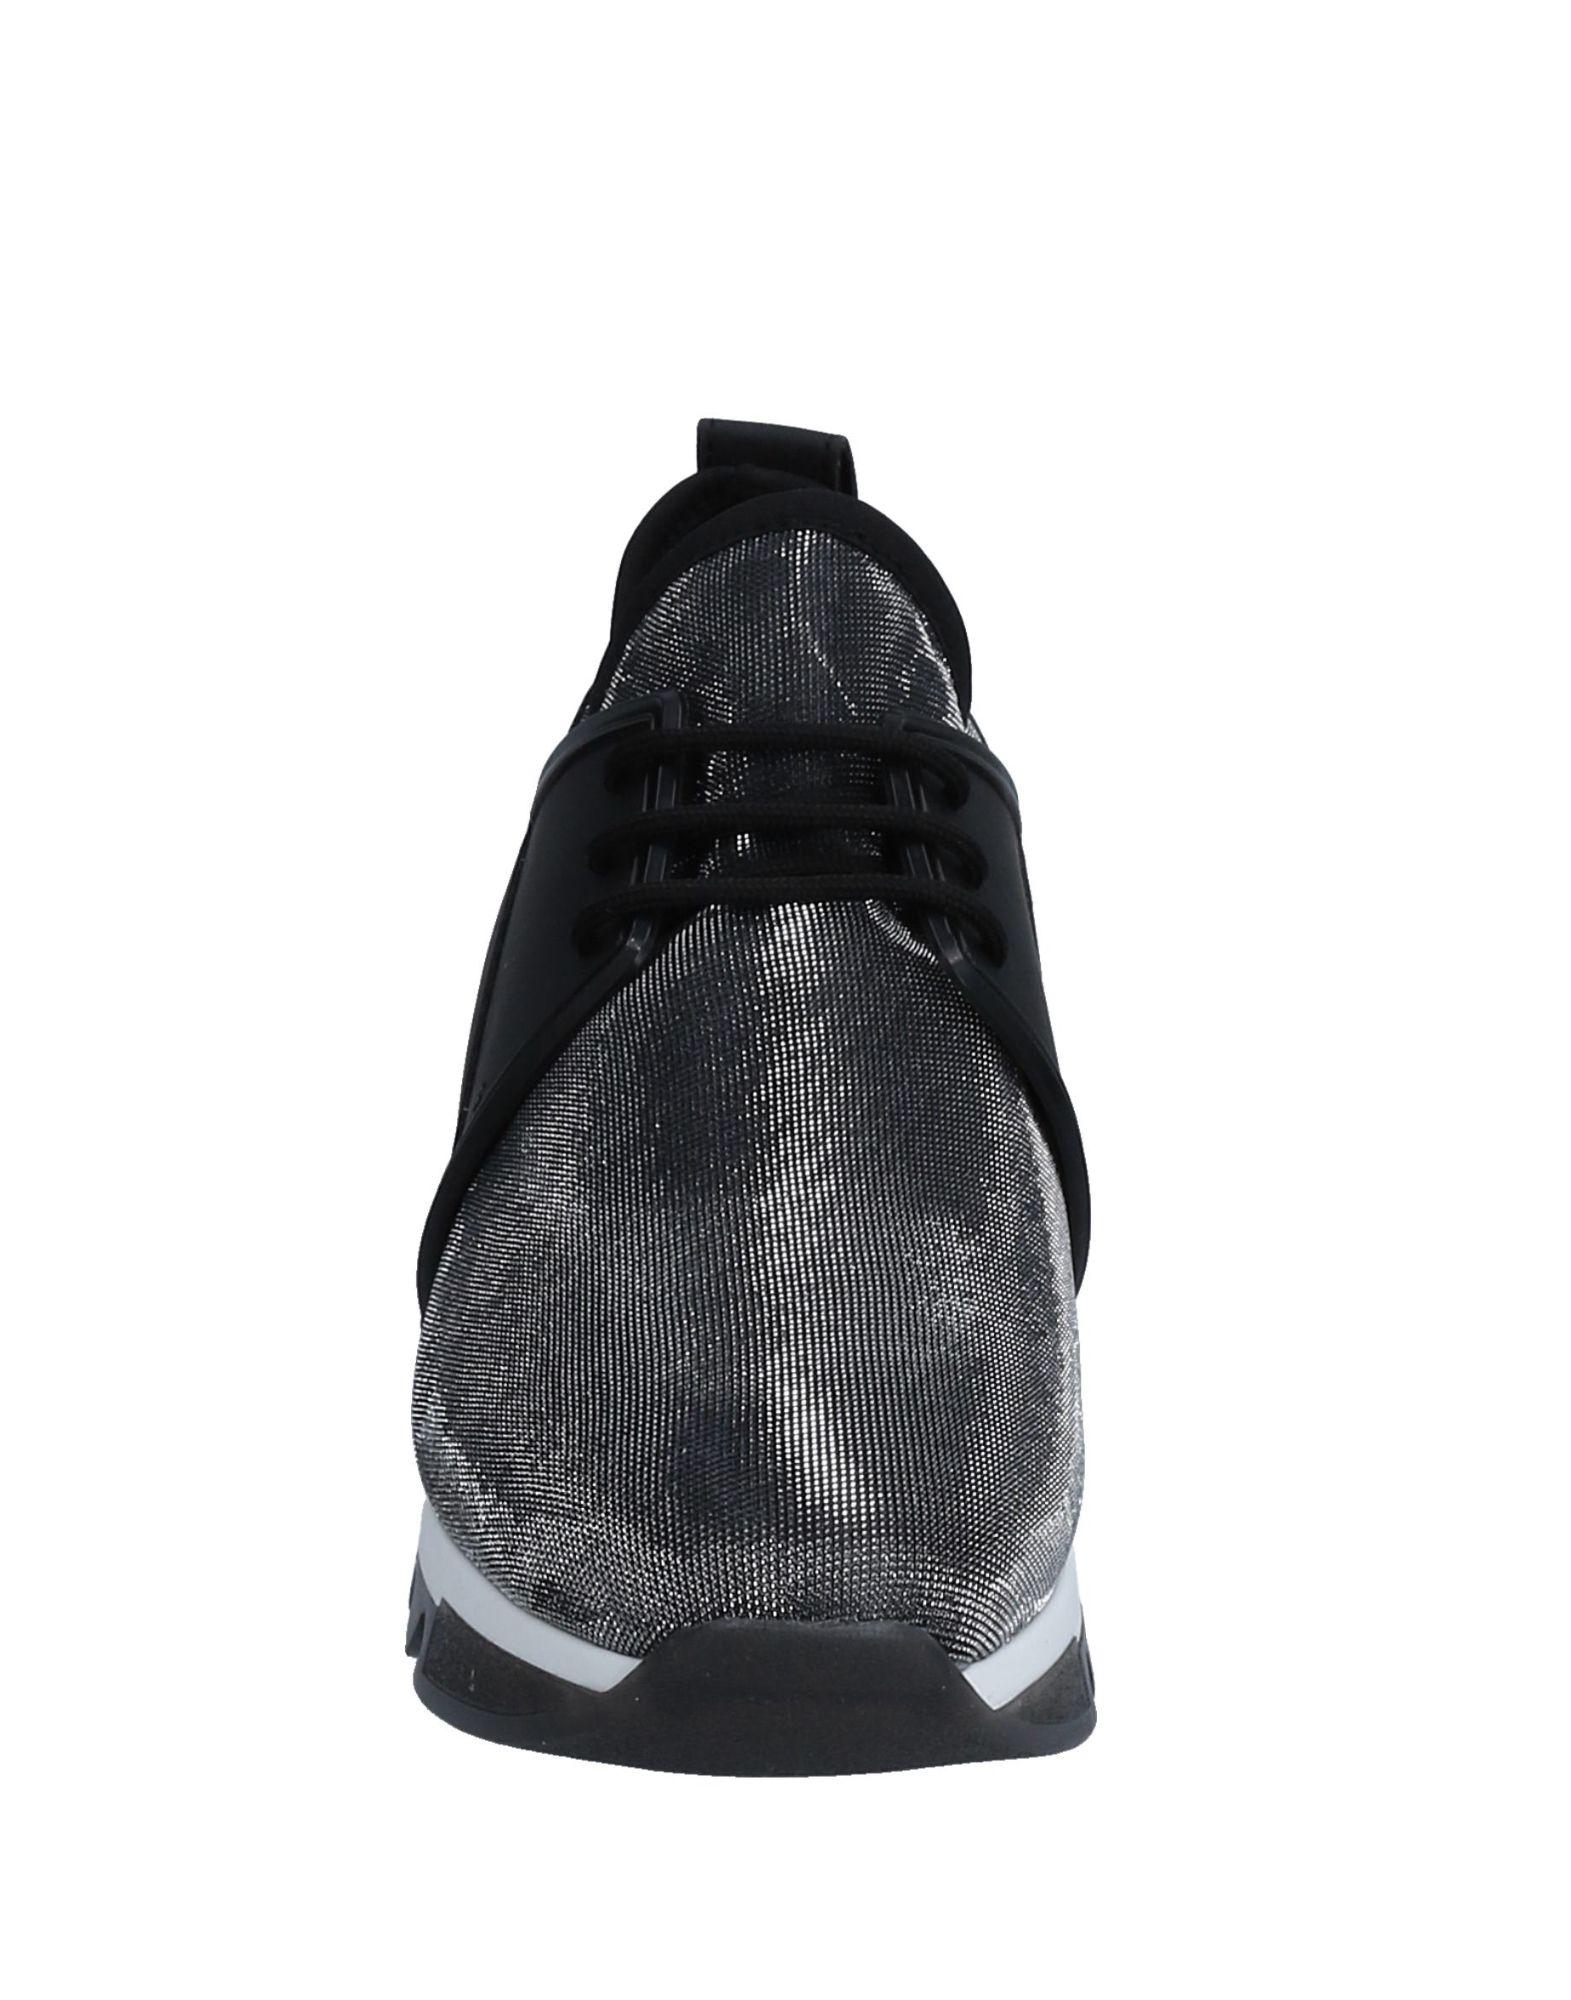 Stilvolle Sneakers billige Schuhe Alexander Smith Sneakers Stilvolle Damen  11526967XB d16232